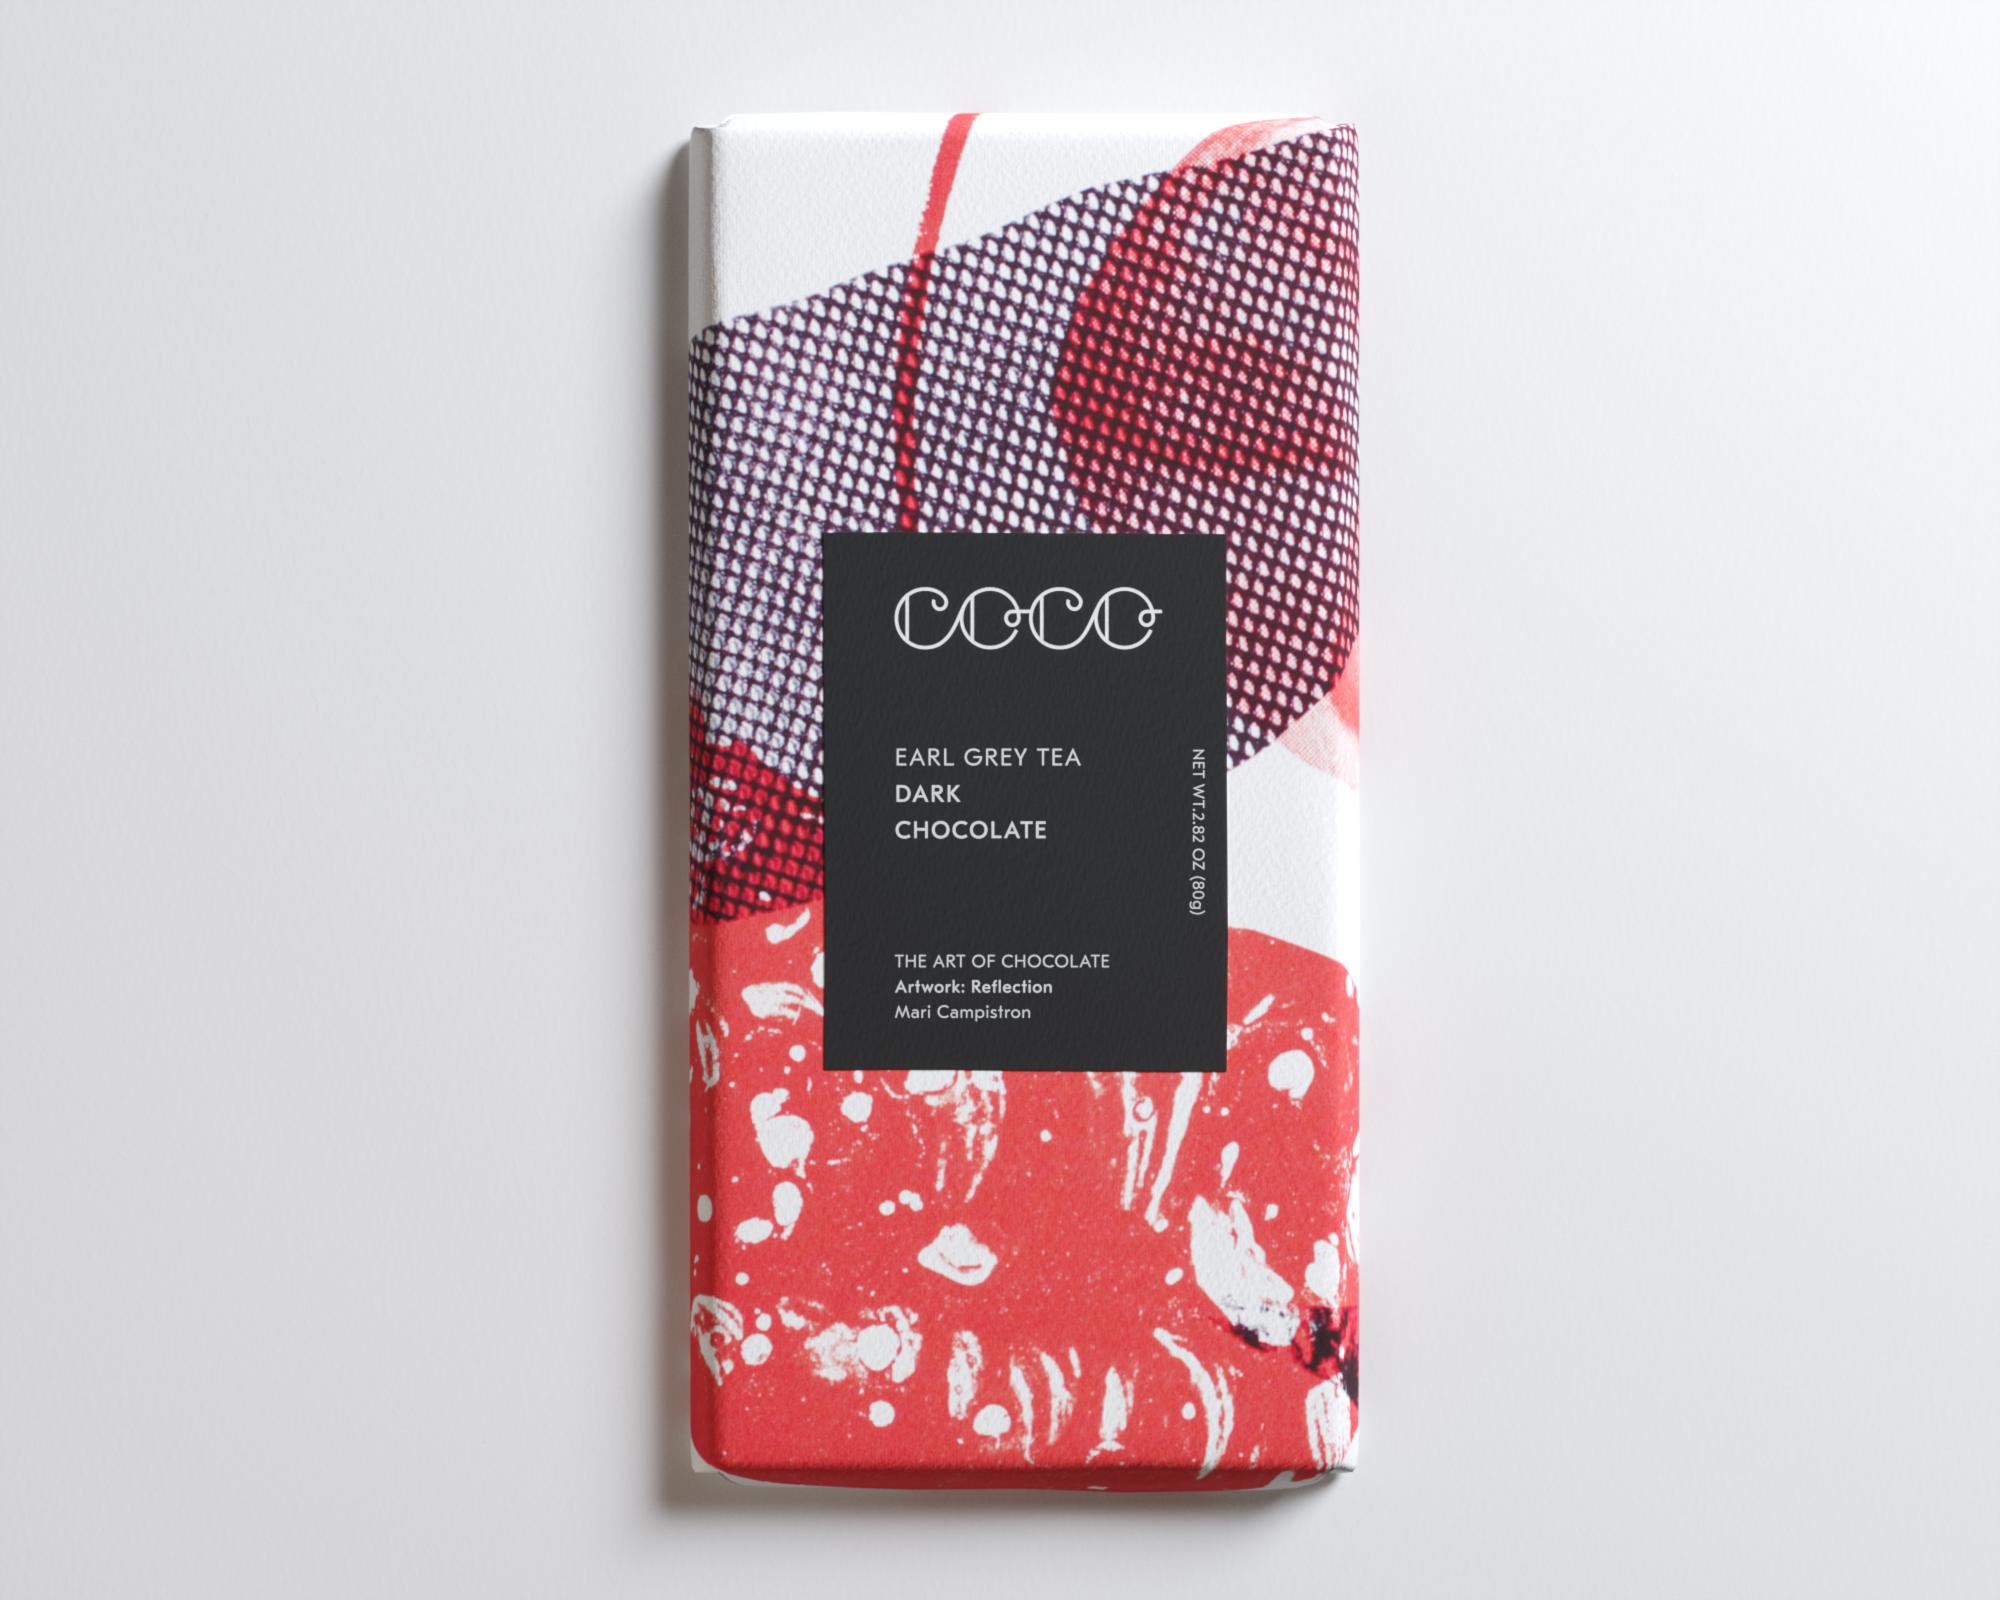 COCO - Earl Grey Tea